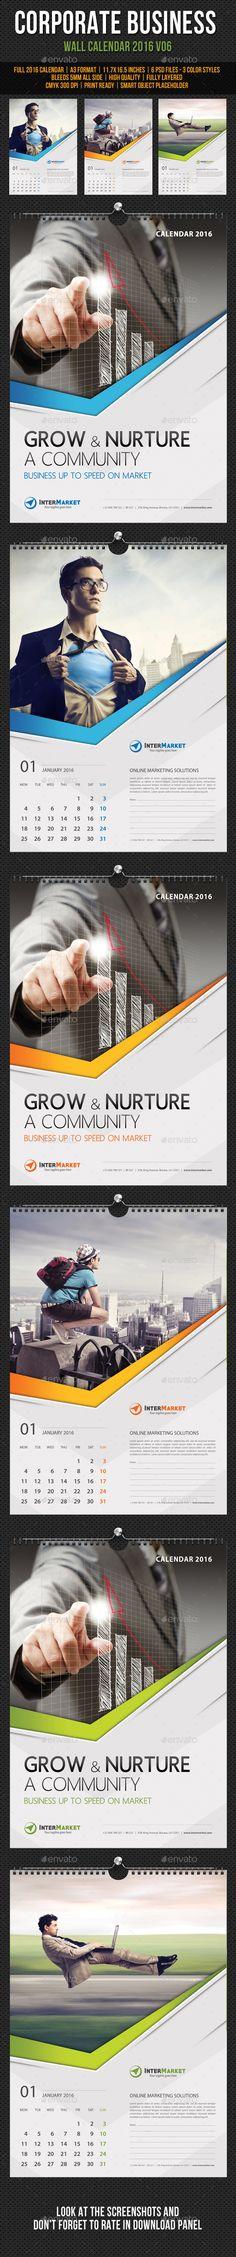 Corporate Business Wall Calendar 2016 PSD Template #design Download…